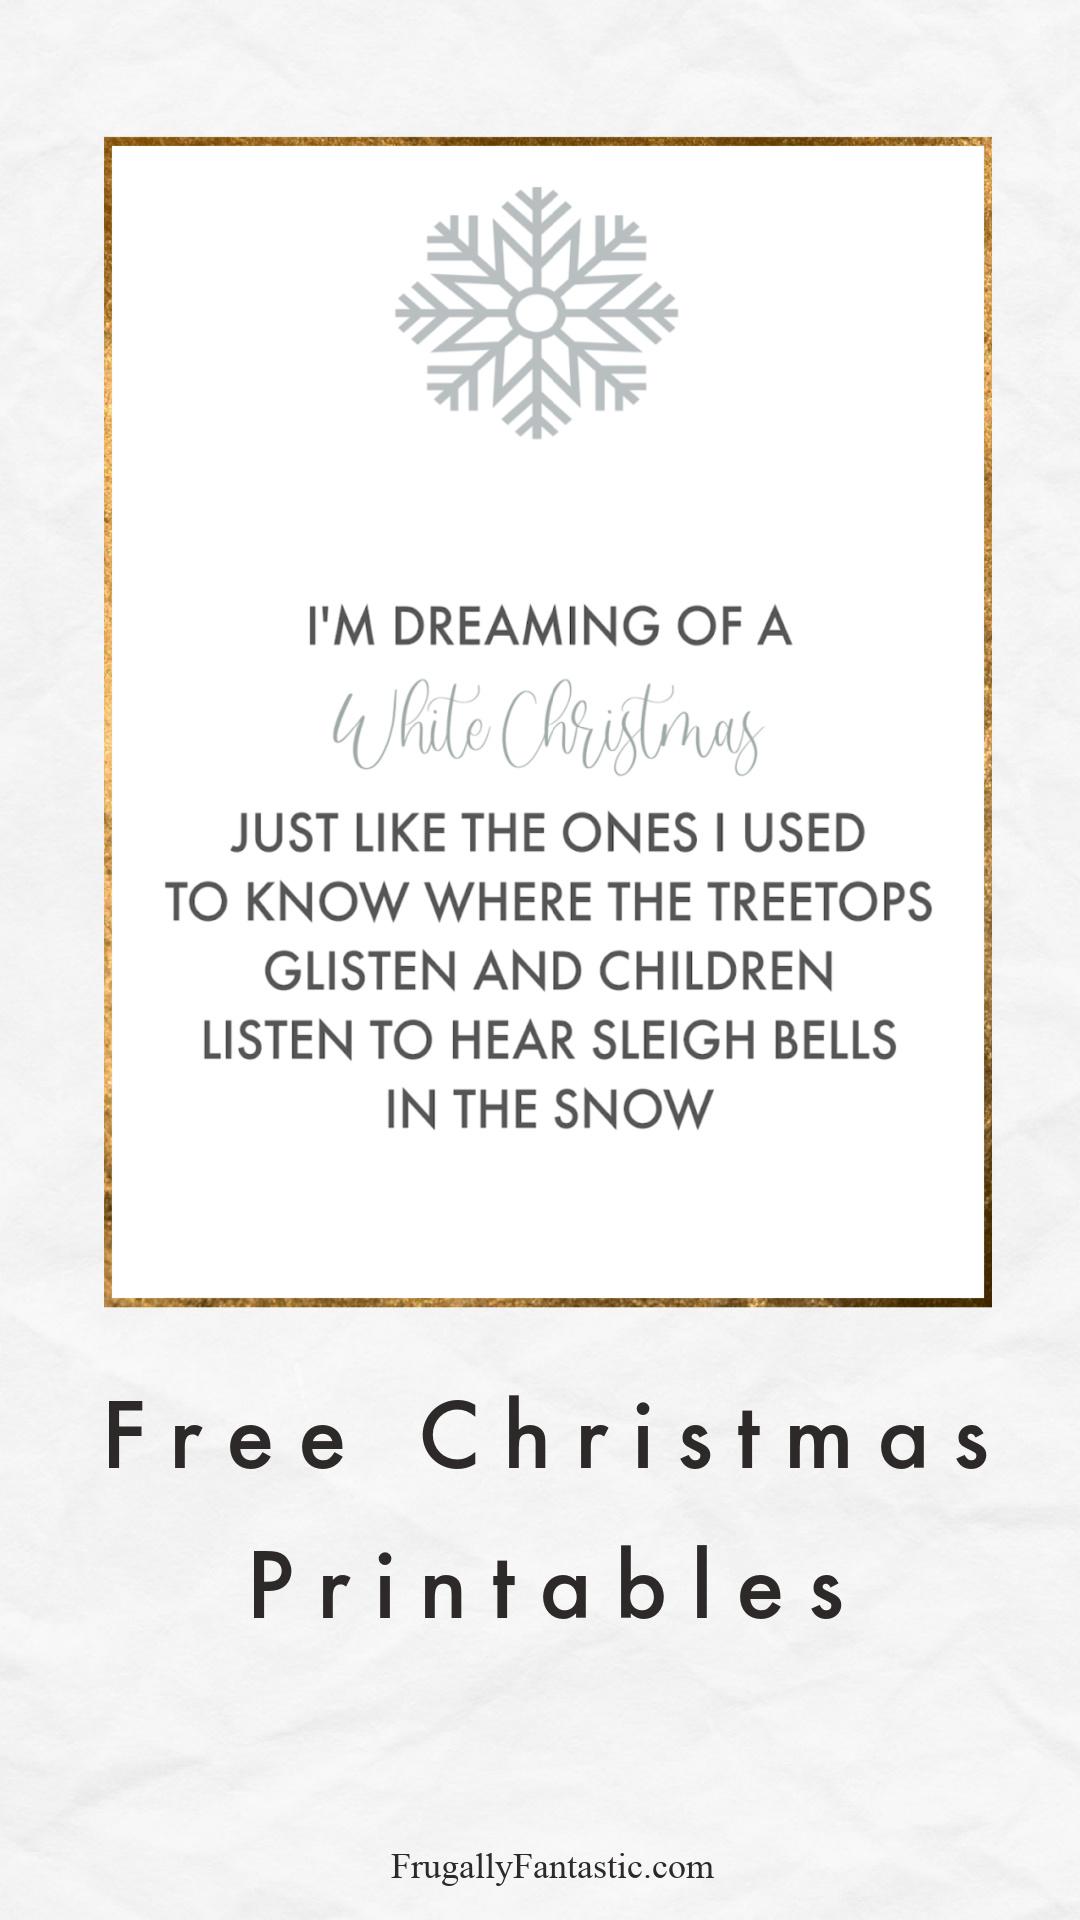 Free Christmas Art Print FrugallyFantastic.com